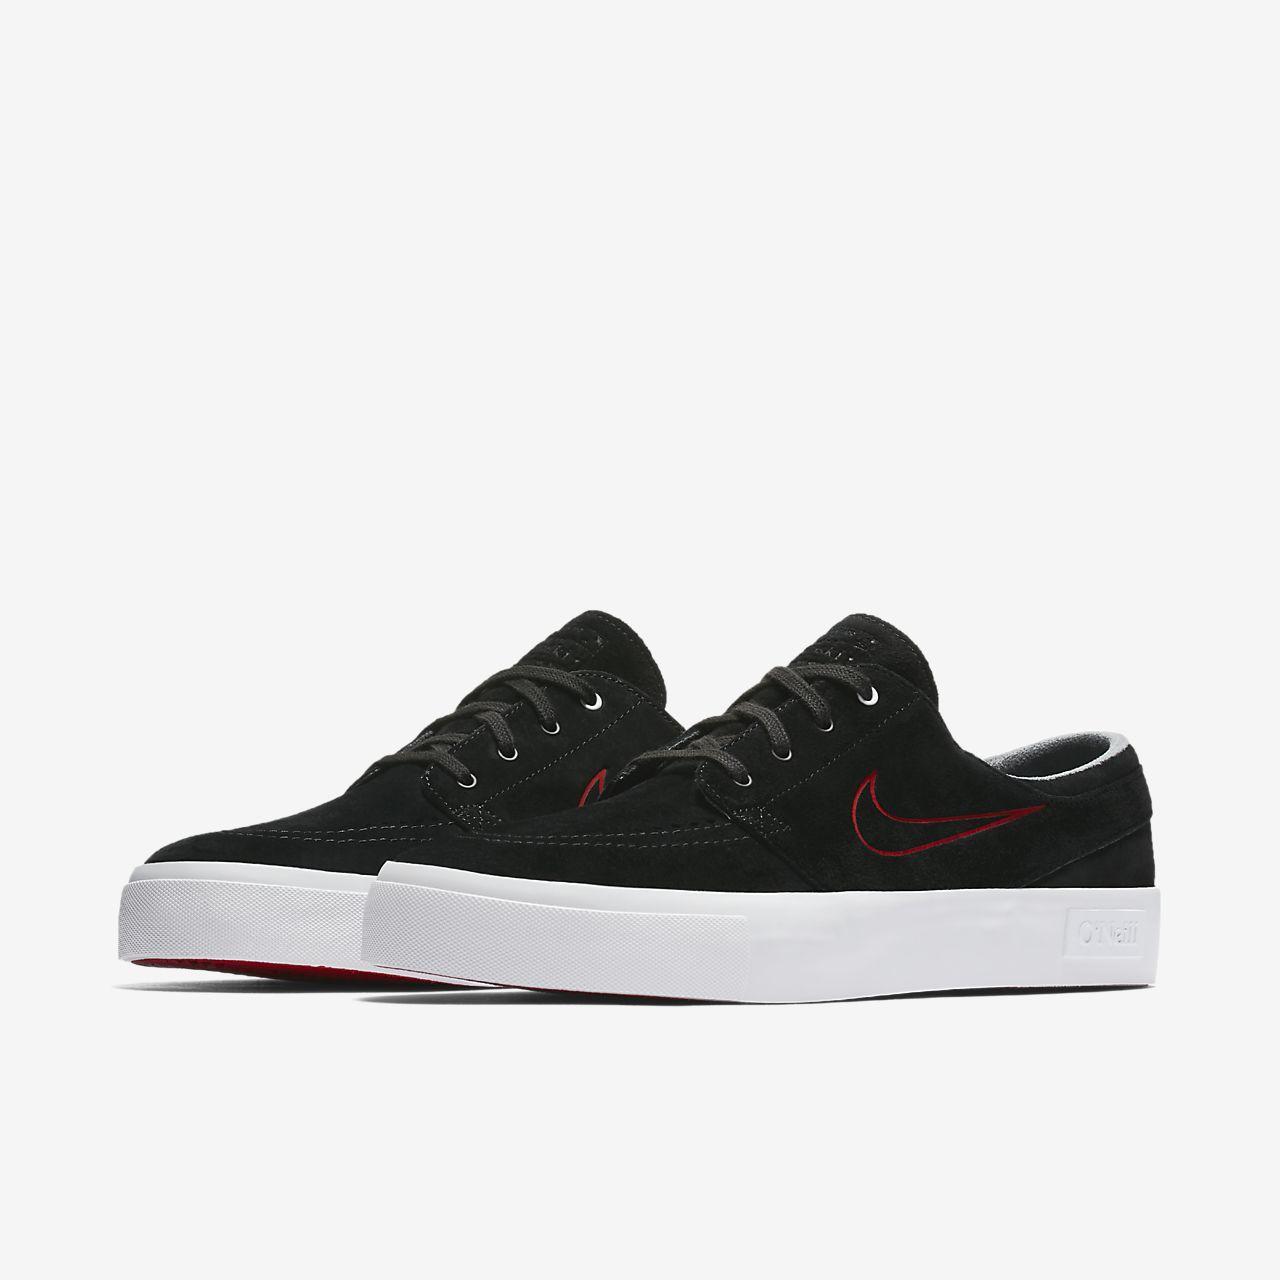 ... Skateboarding Nike SB Air Zoom Stefan Janoski HT 'O'Neill' Men's  Skateboarding Shoe